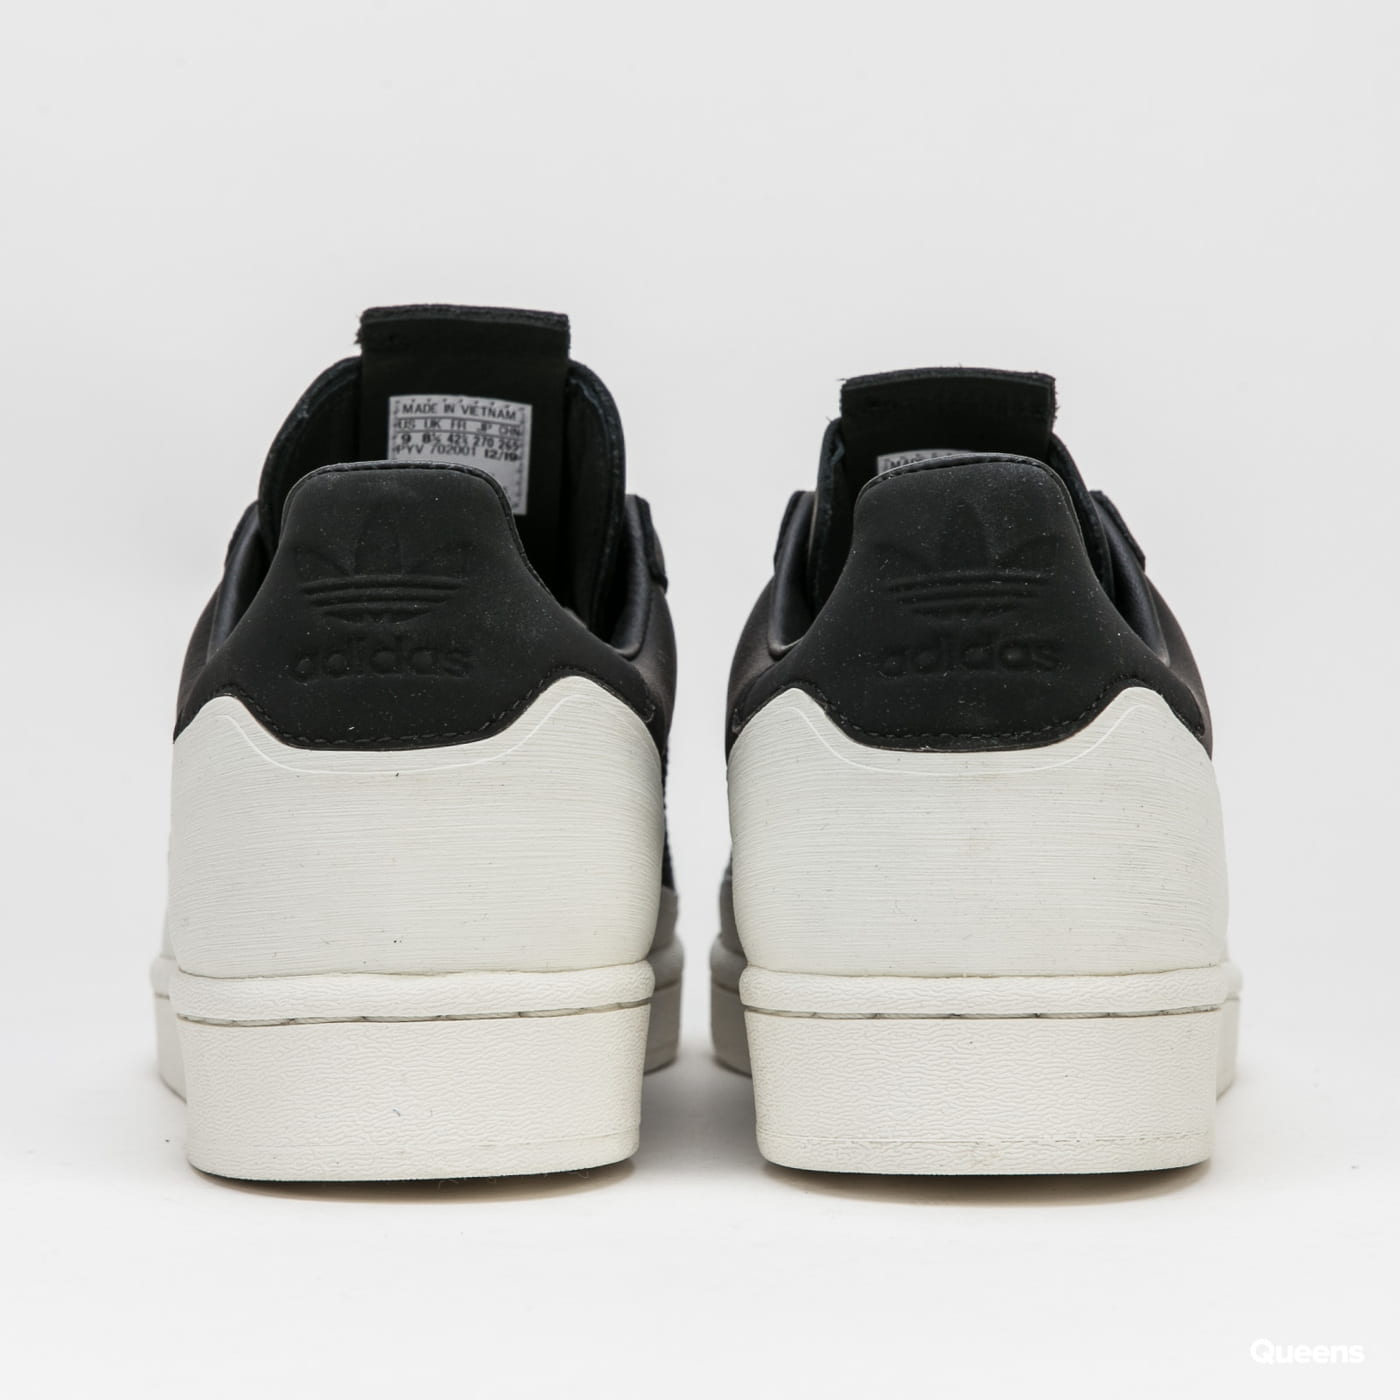 adidas Originals Superstar MG cblack / owhite / cblack